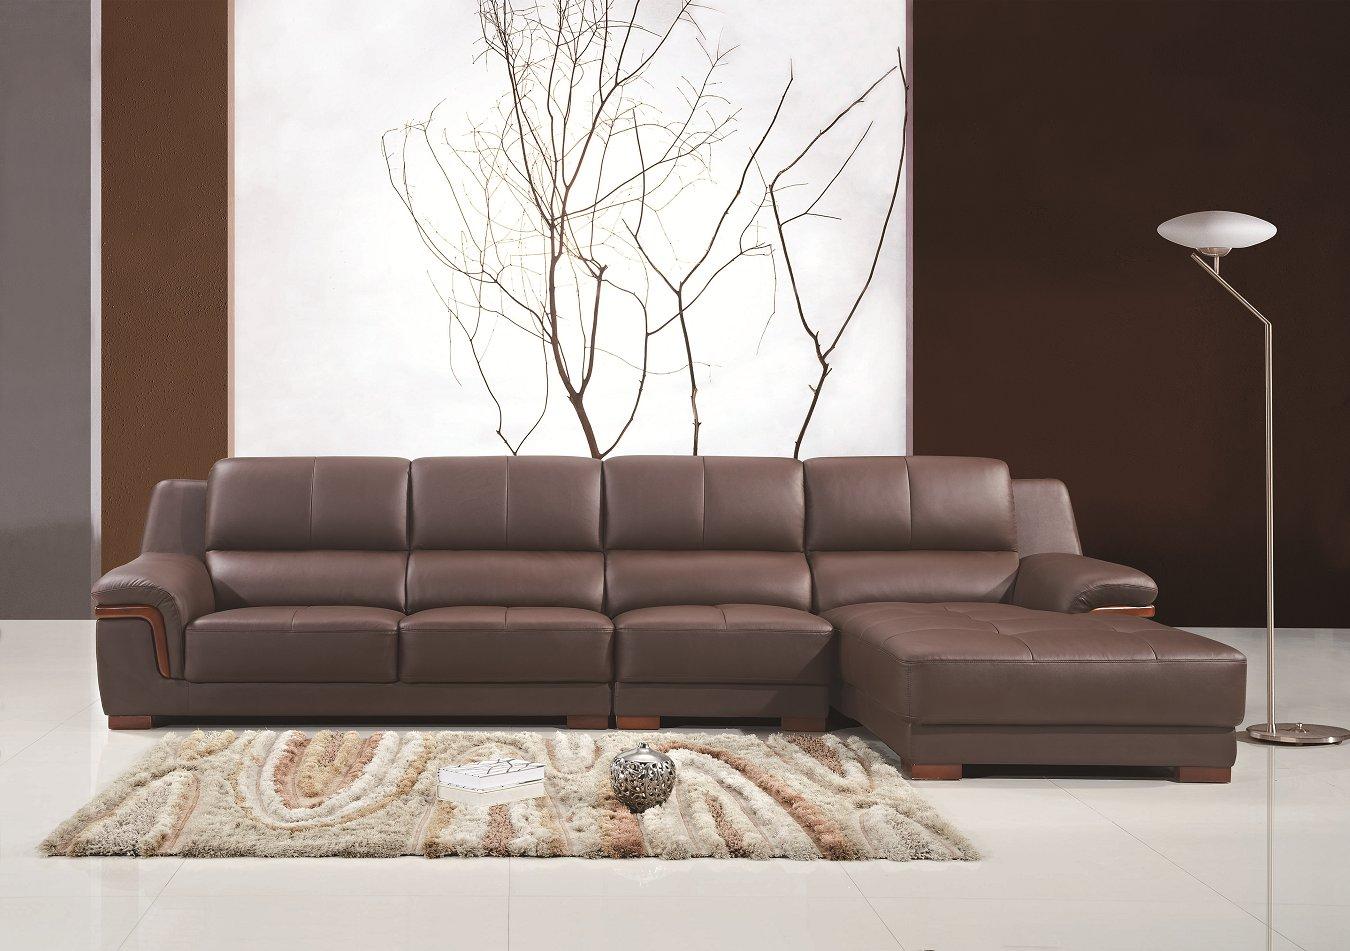 2017 Modern Living Room PU Leather Sofa for Home